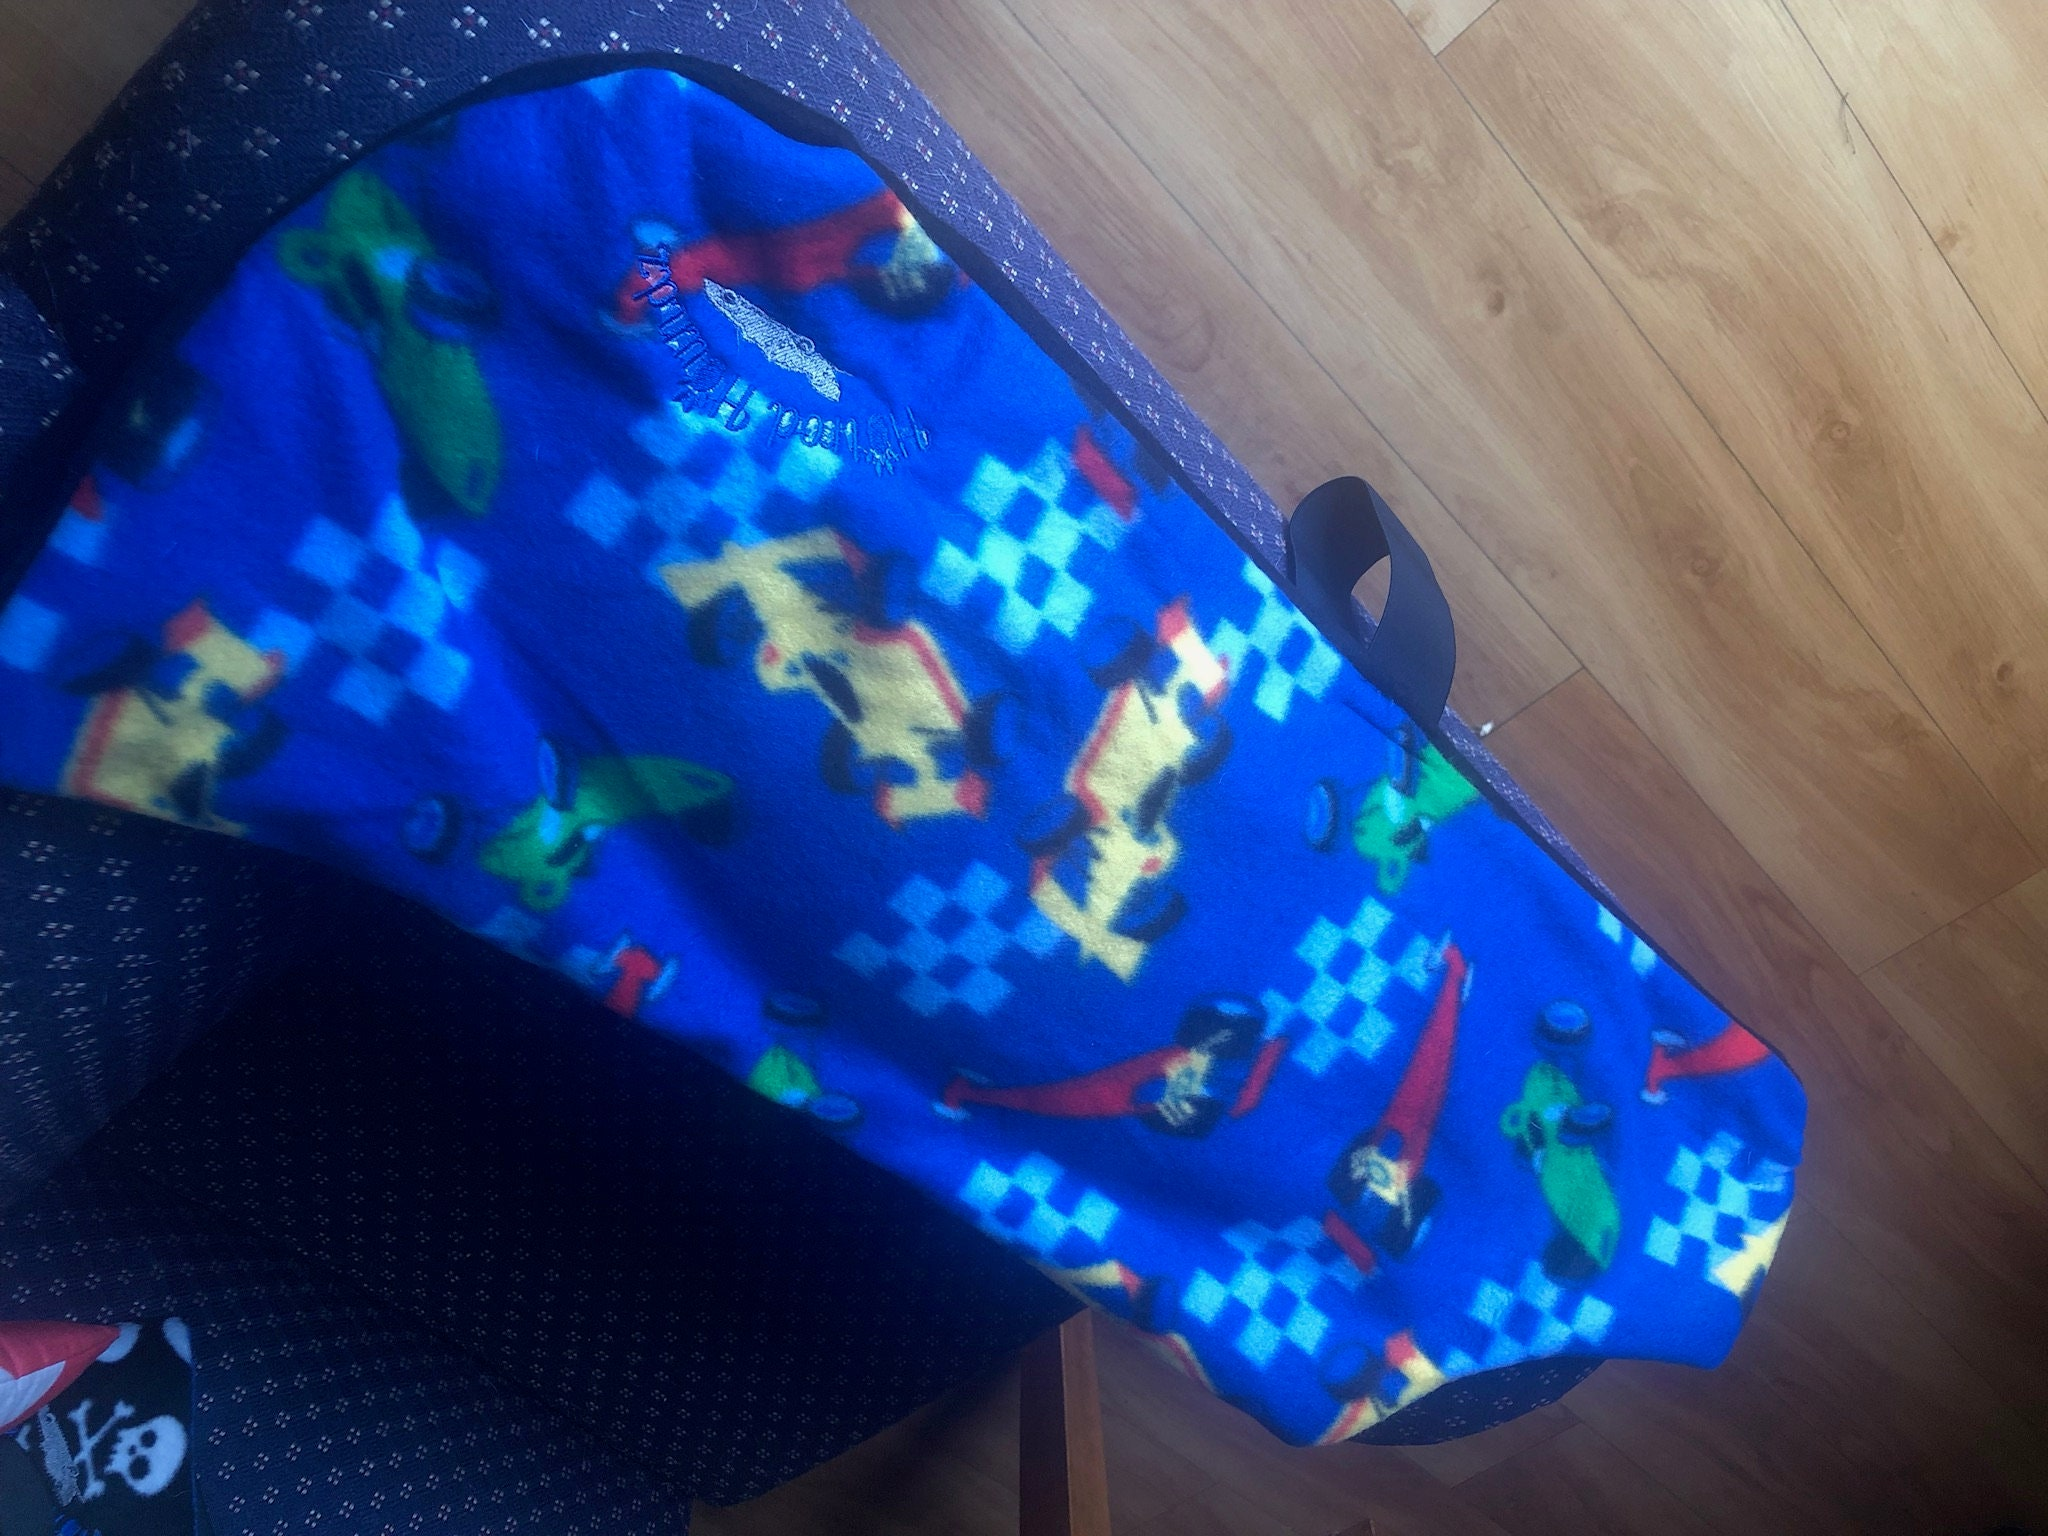 Racecar - dog coat - fleece - handmade -dog - coat dog wear - dog coat - - coat - blue - large dog afba61